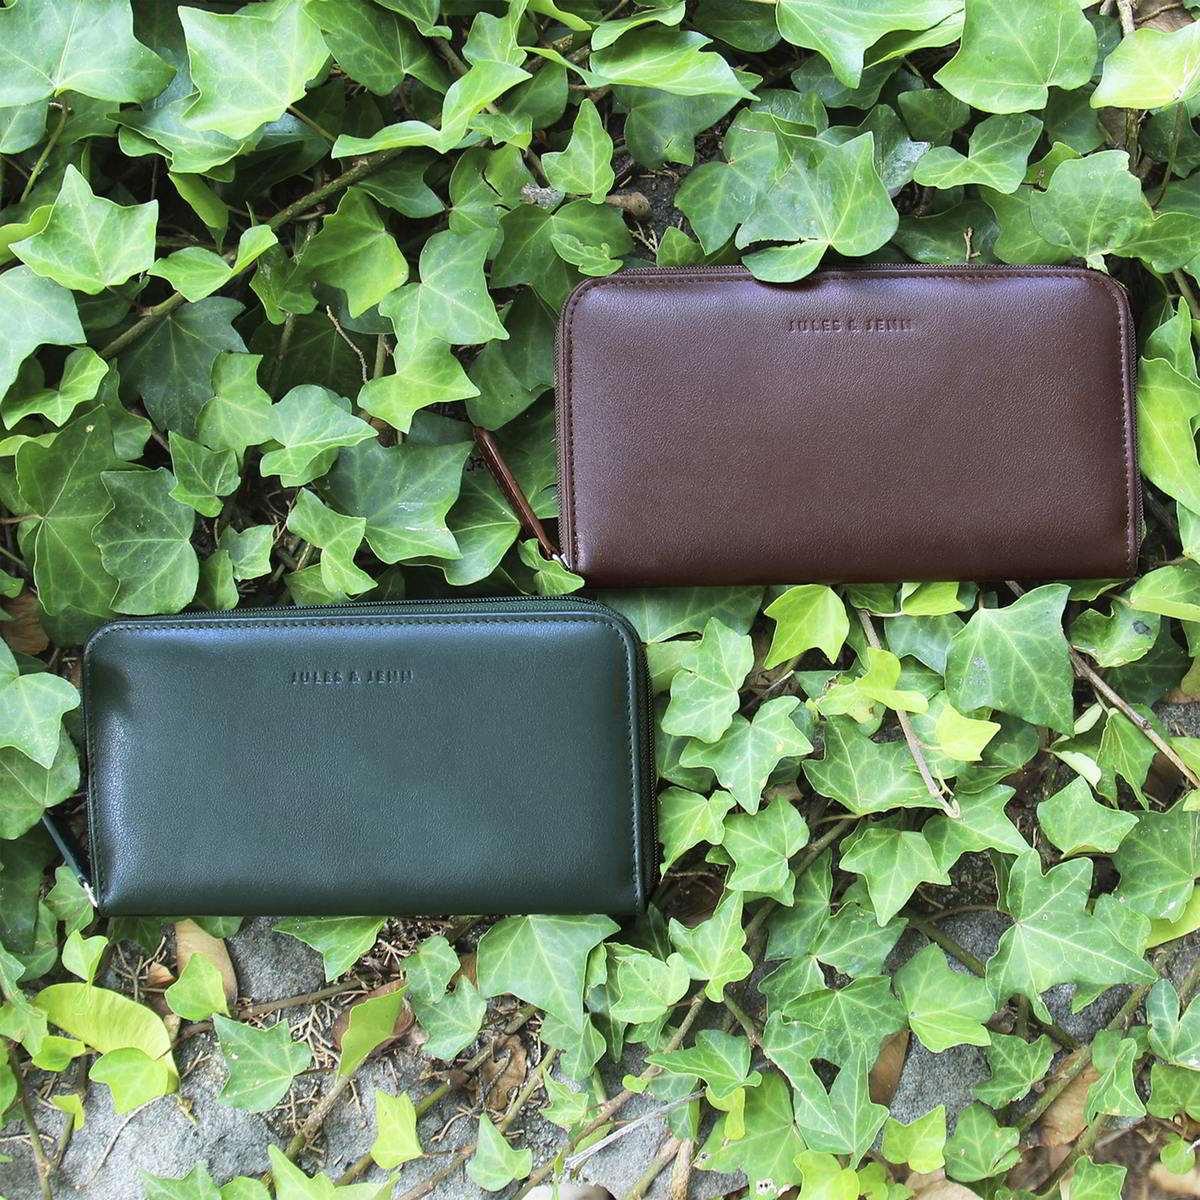 Jules and Jenn - compagnon marron & vert